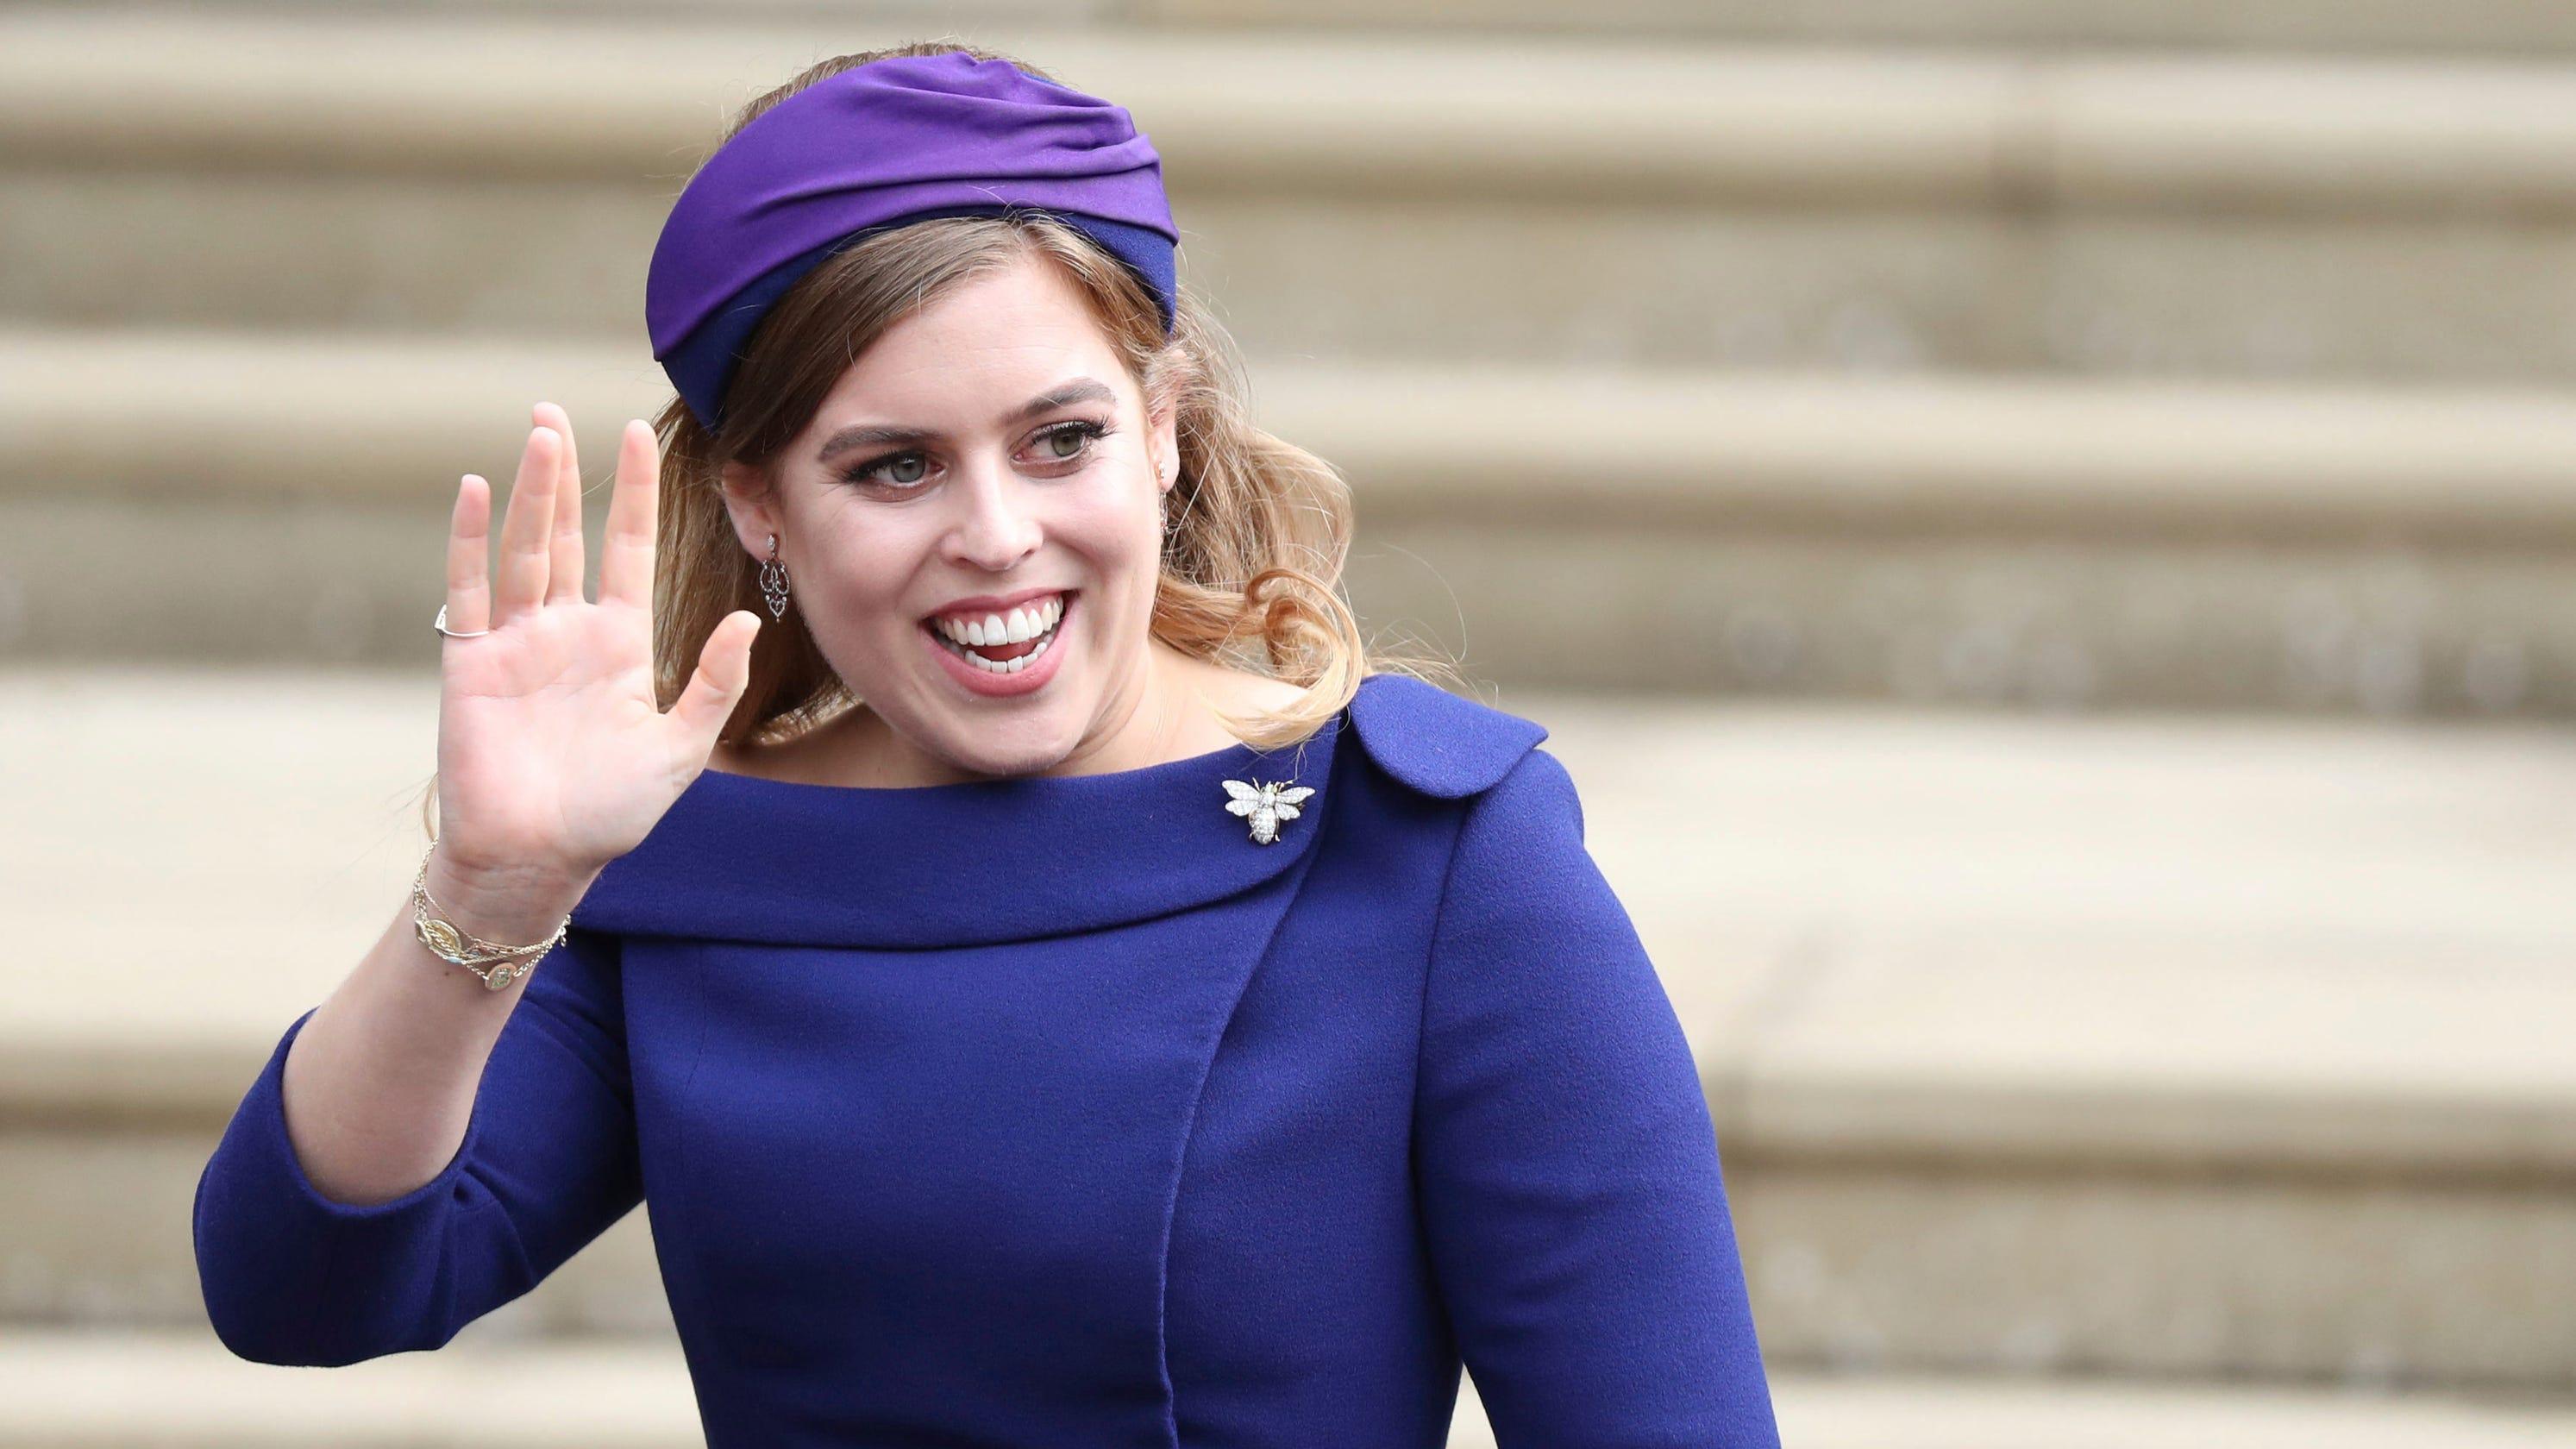 Princess Beatrice of York is engaged! See photos with fiance Edoardo Mapelli Mozzi